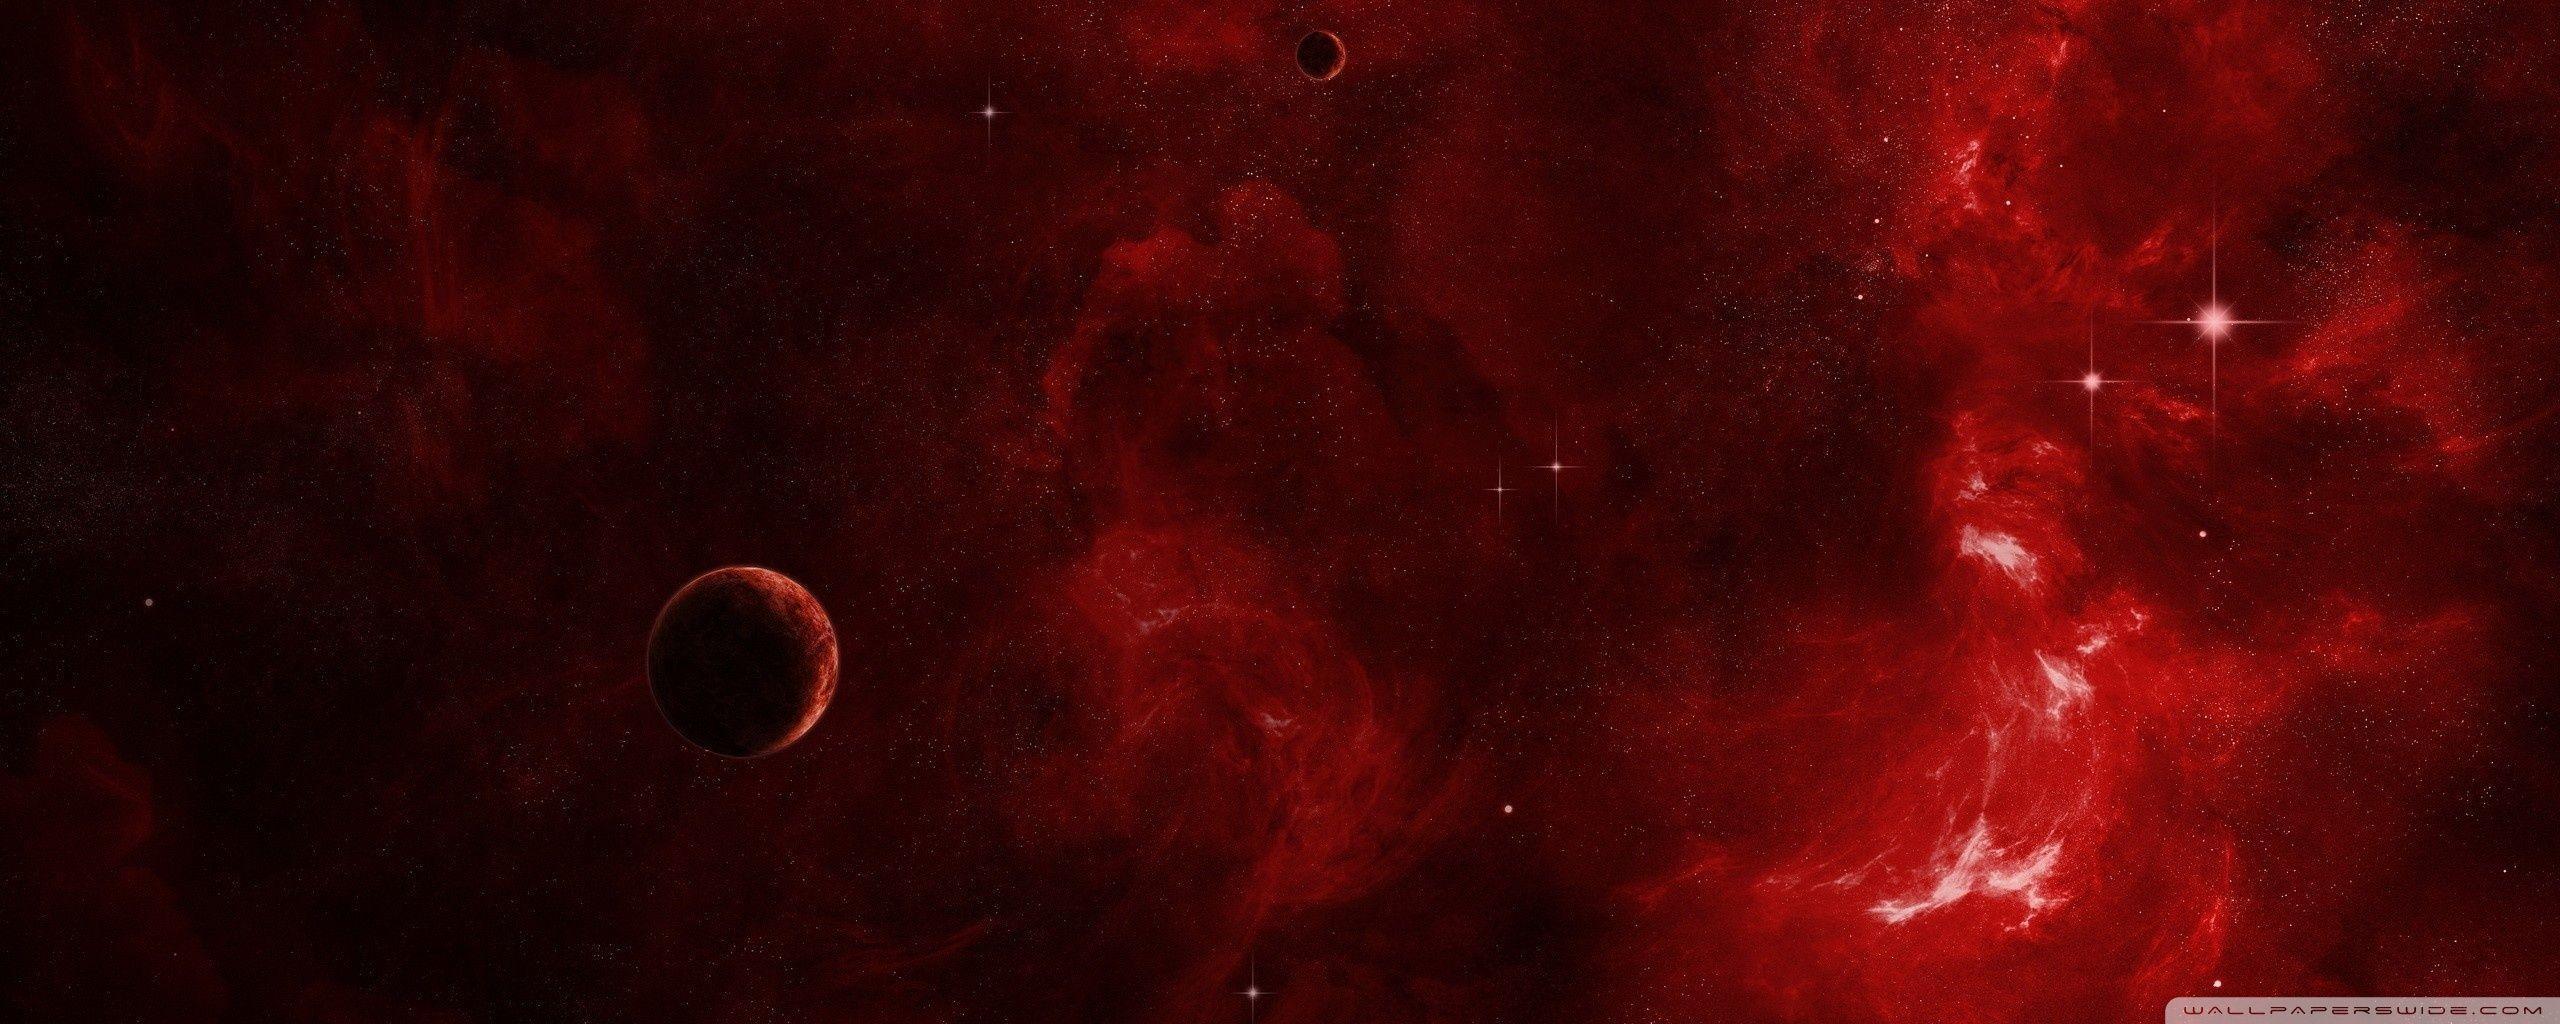 Red Aesthetic Desktop Wallpapers Top Free Red Aesthetic Desktop Backgrounds Wallpaperaccess